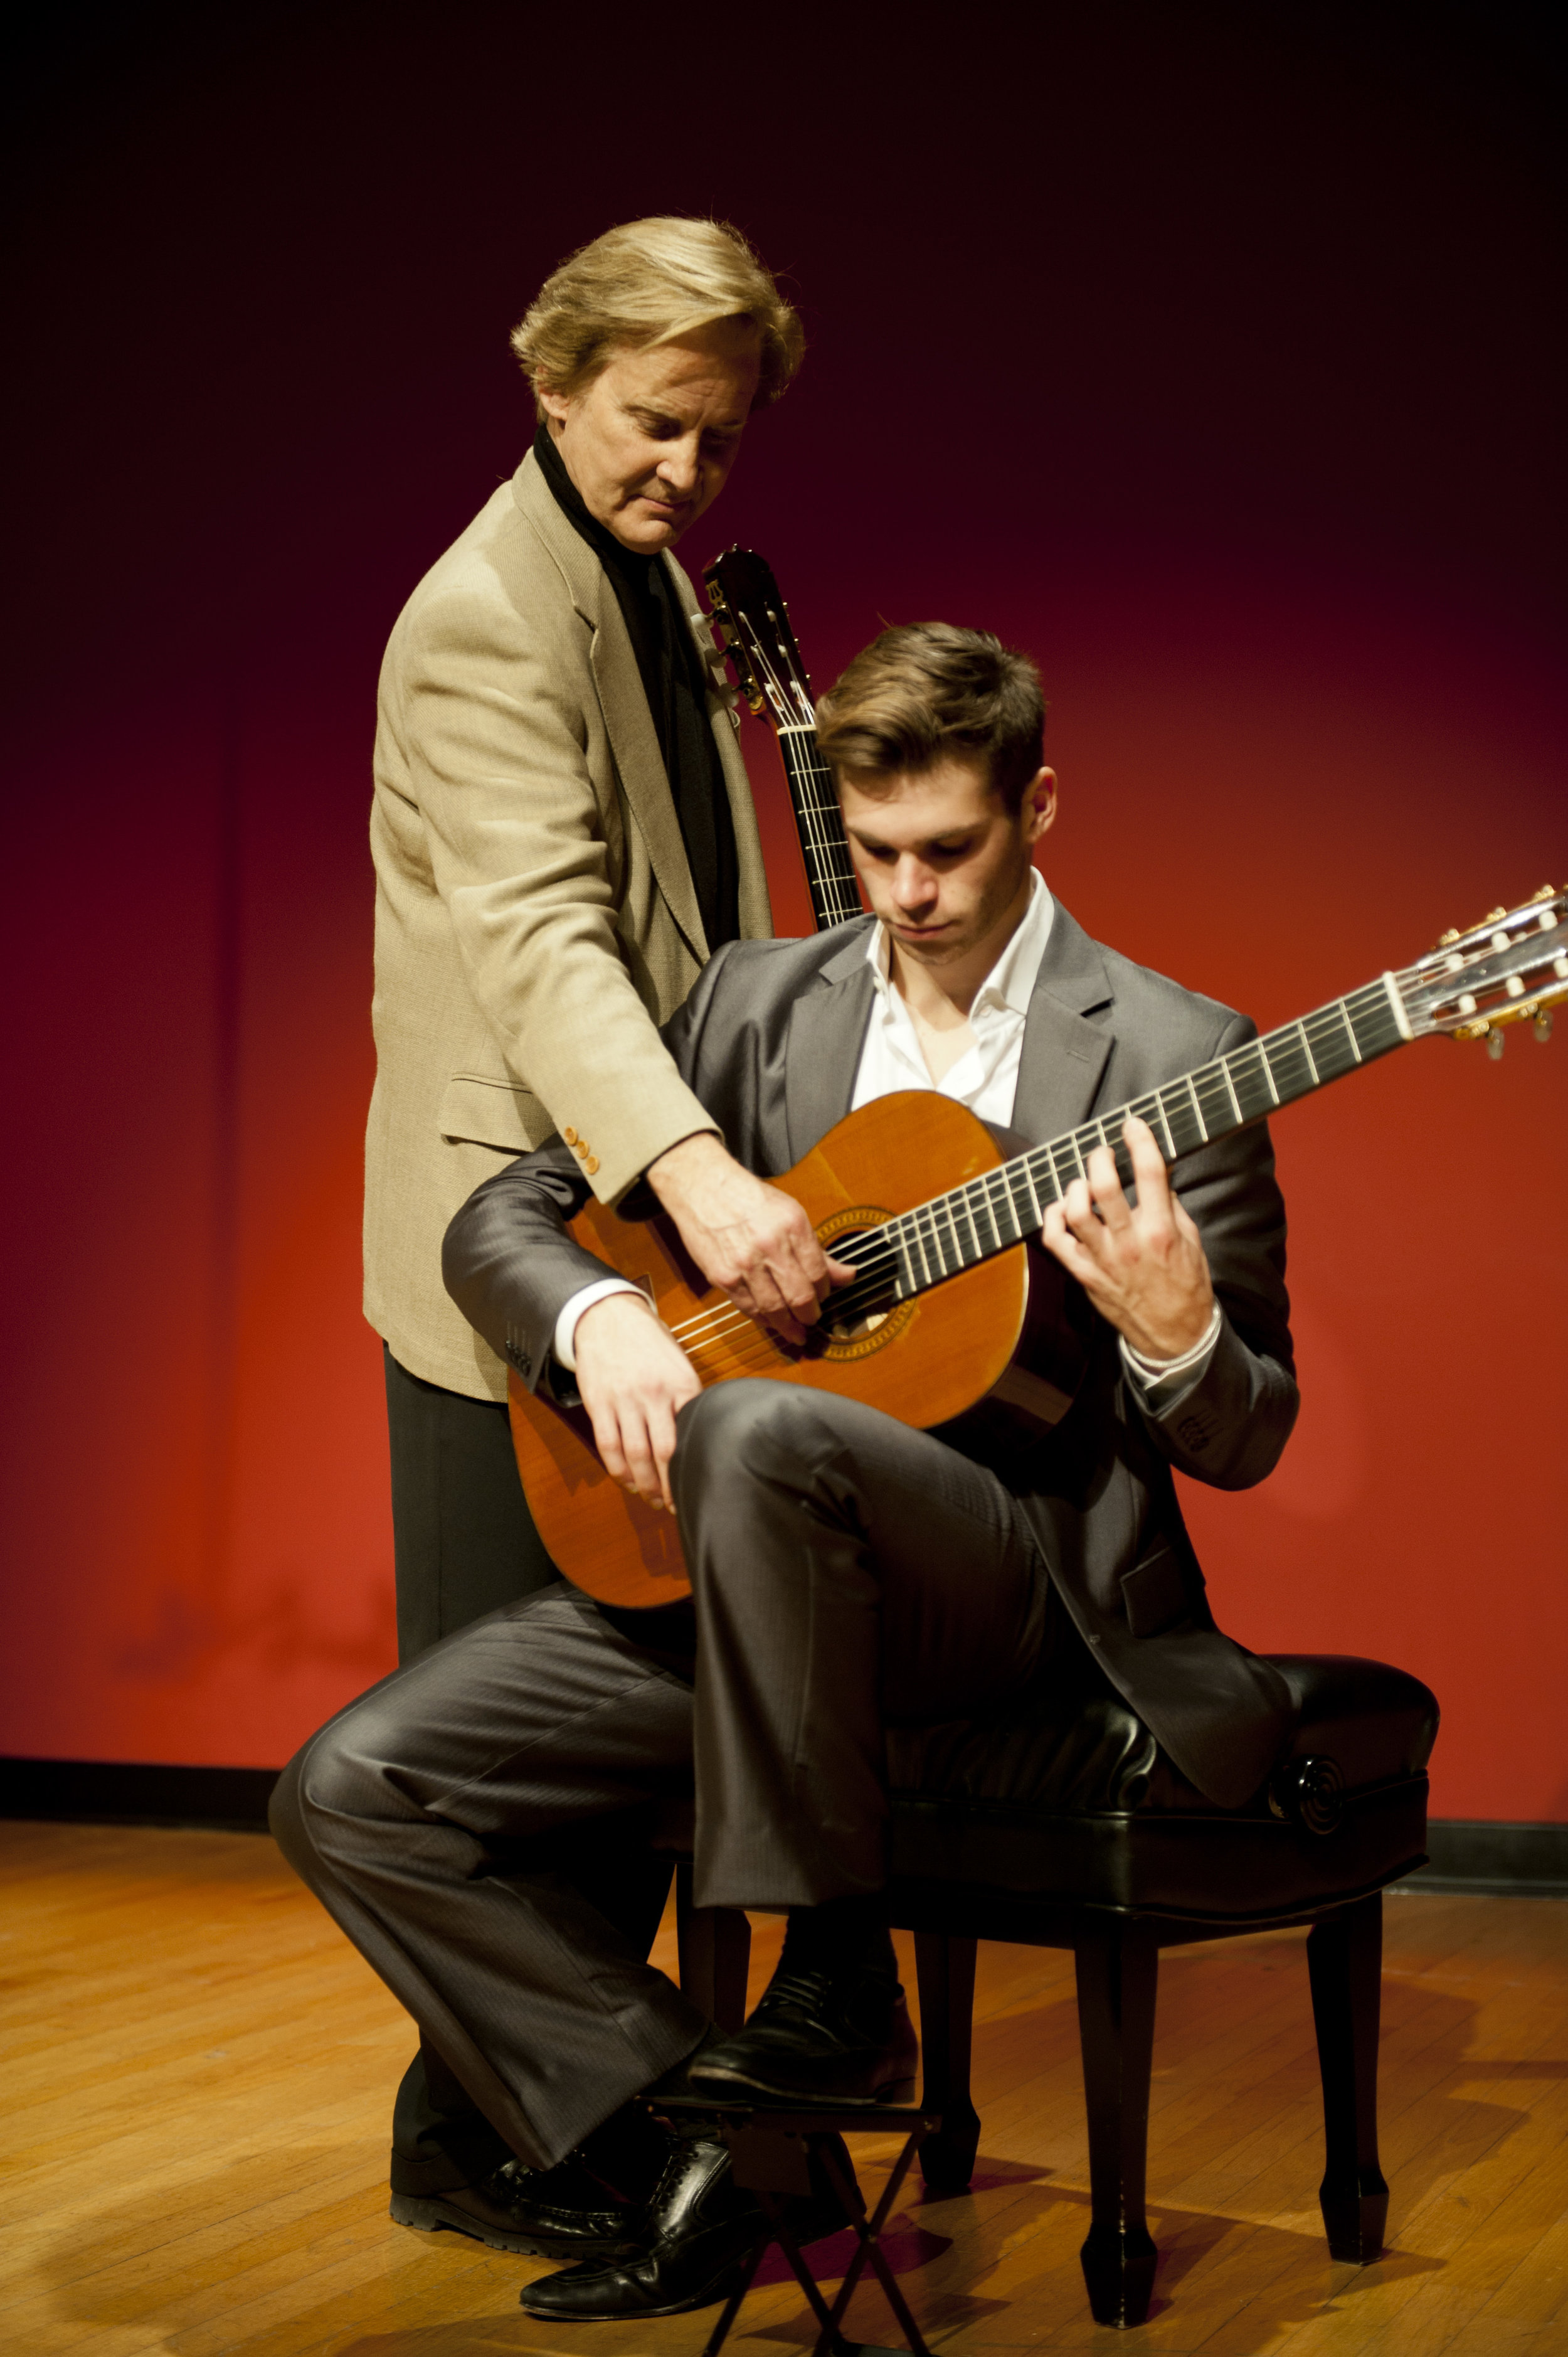 Christopher Parkening with student Kevin Enstrom at Pepperdine University.